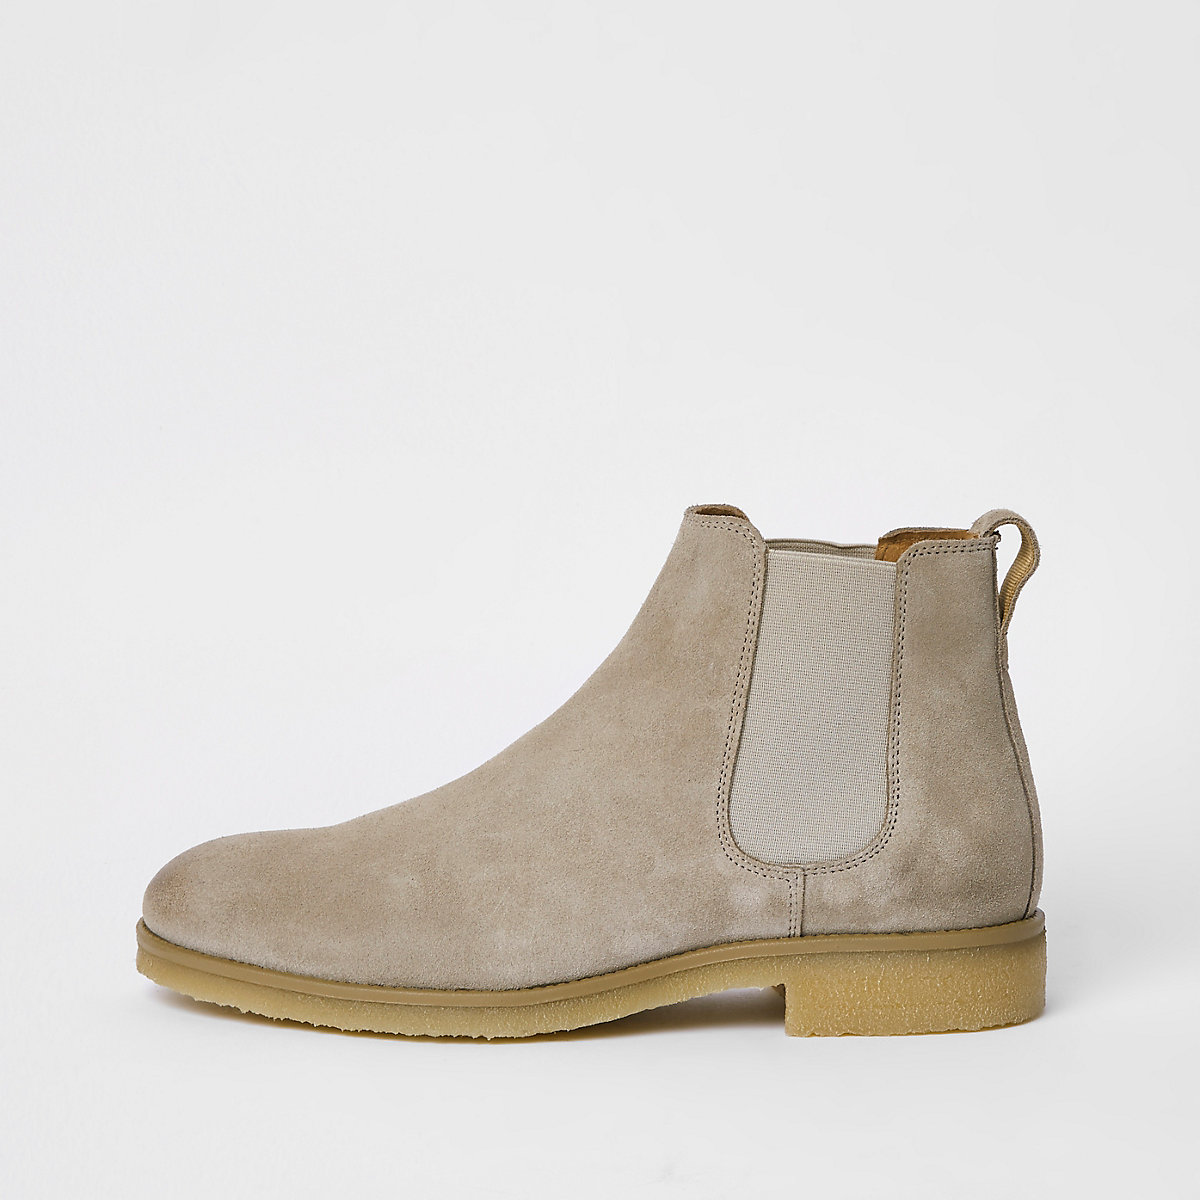 Grey suede chelsea boot